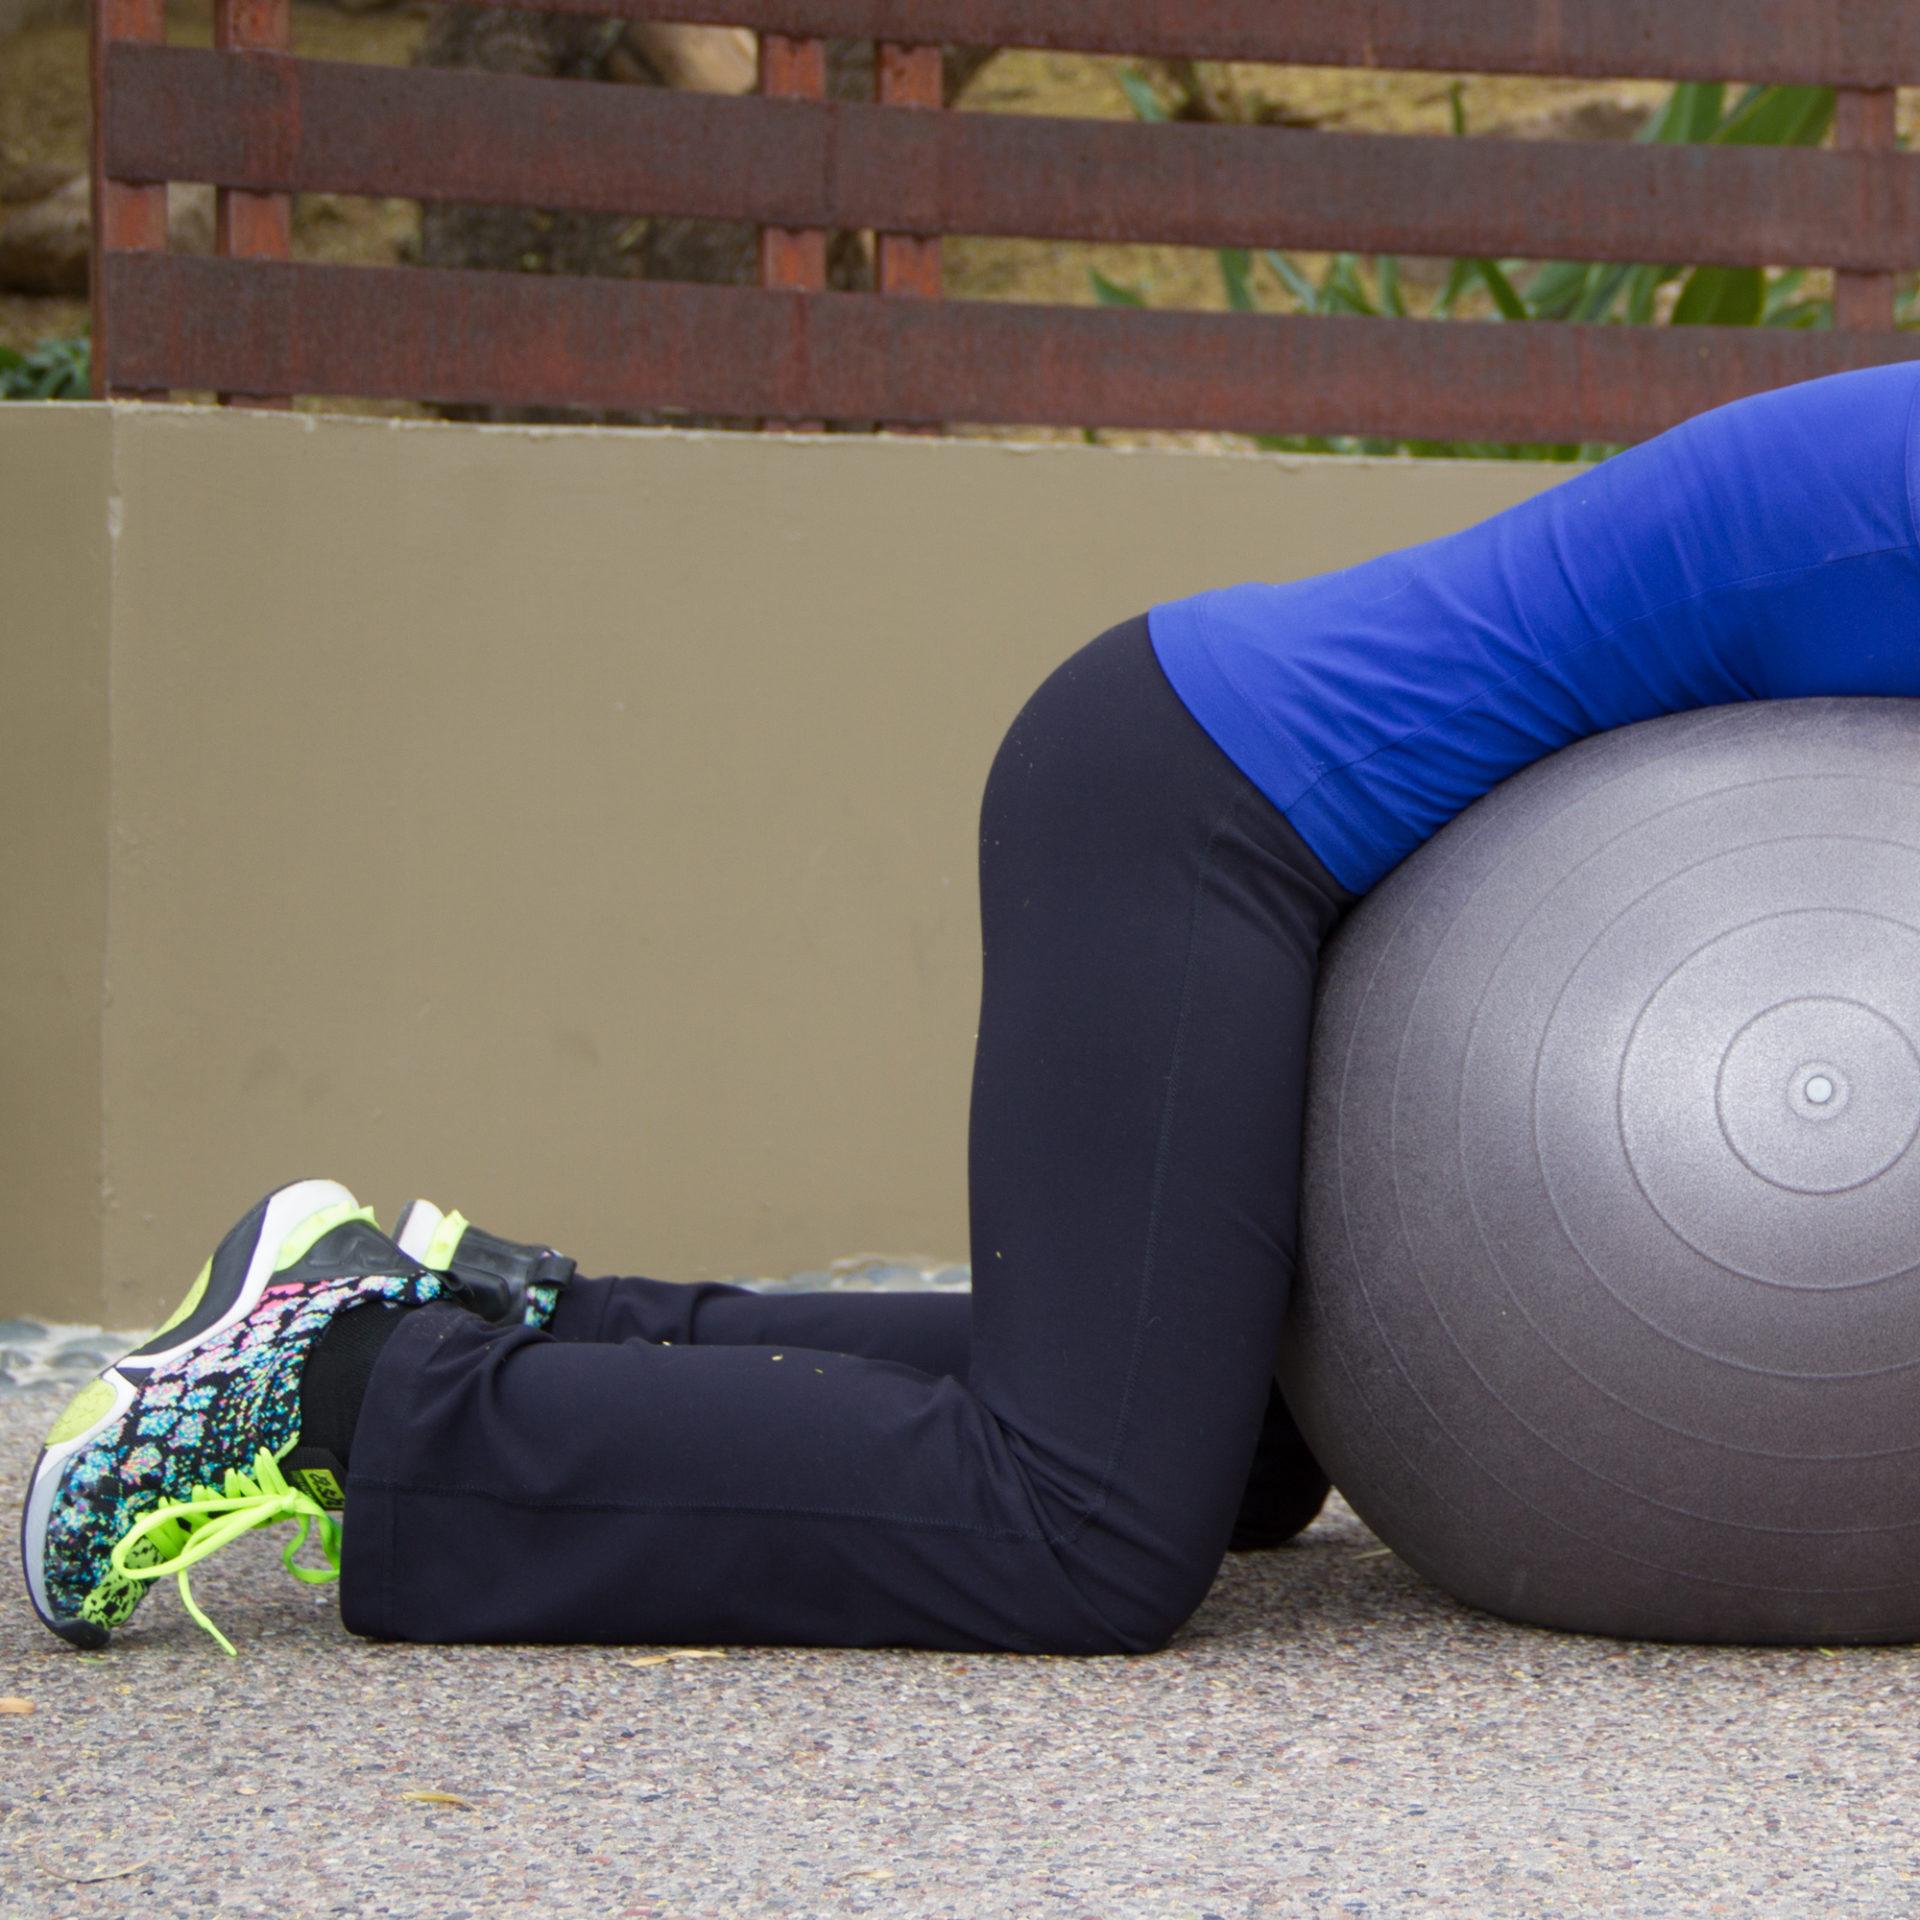 stability ball workout 5 stretch